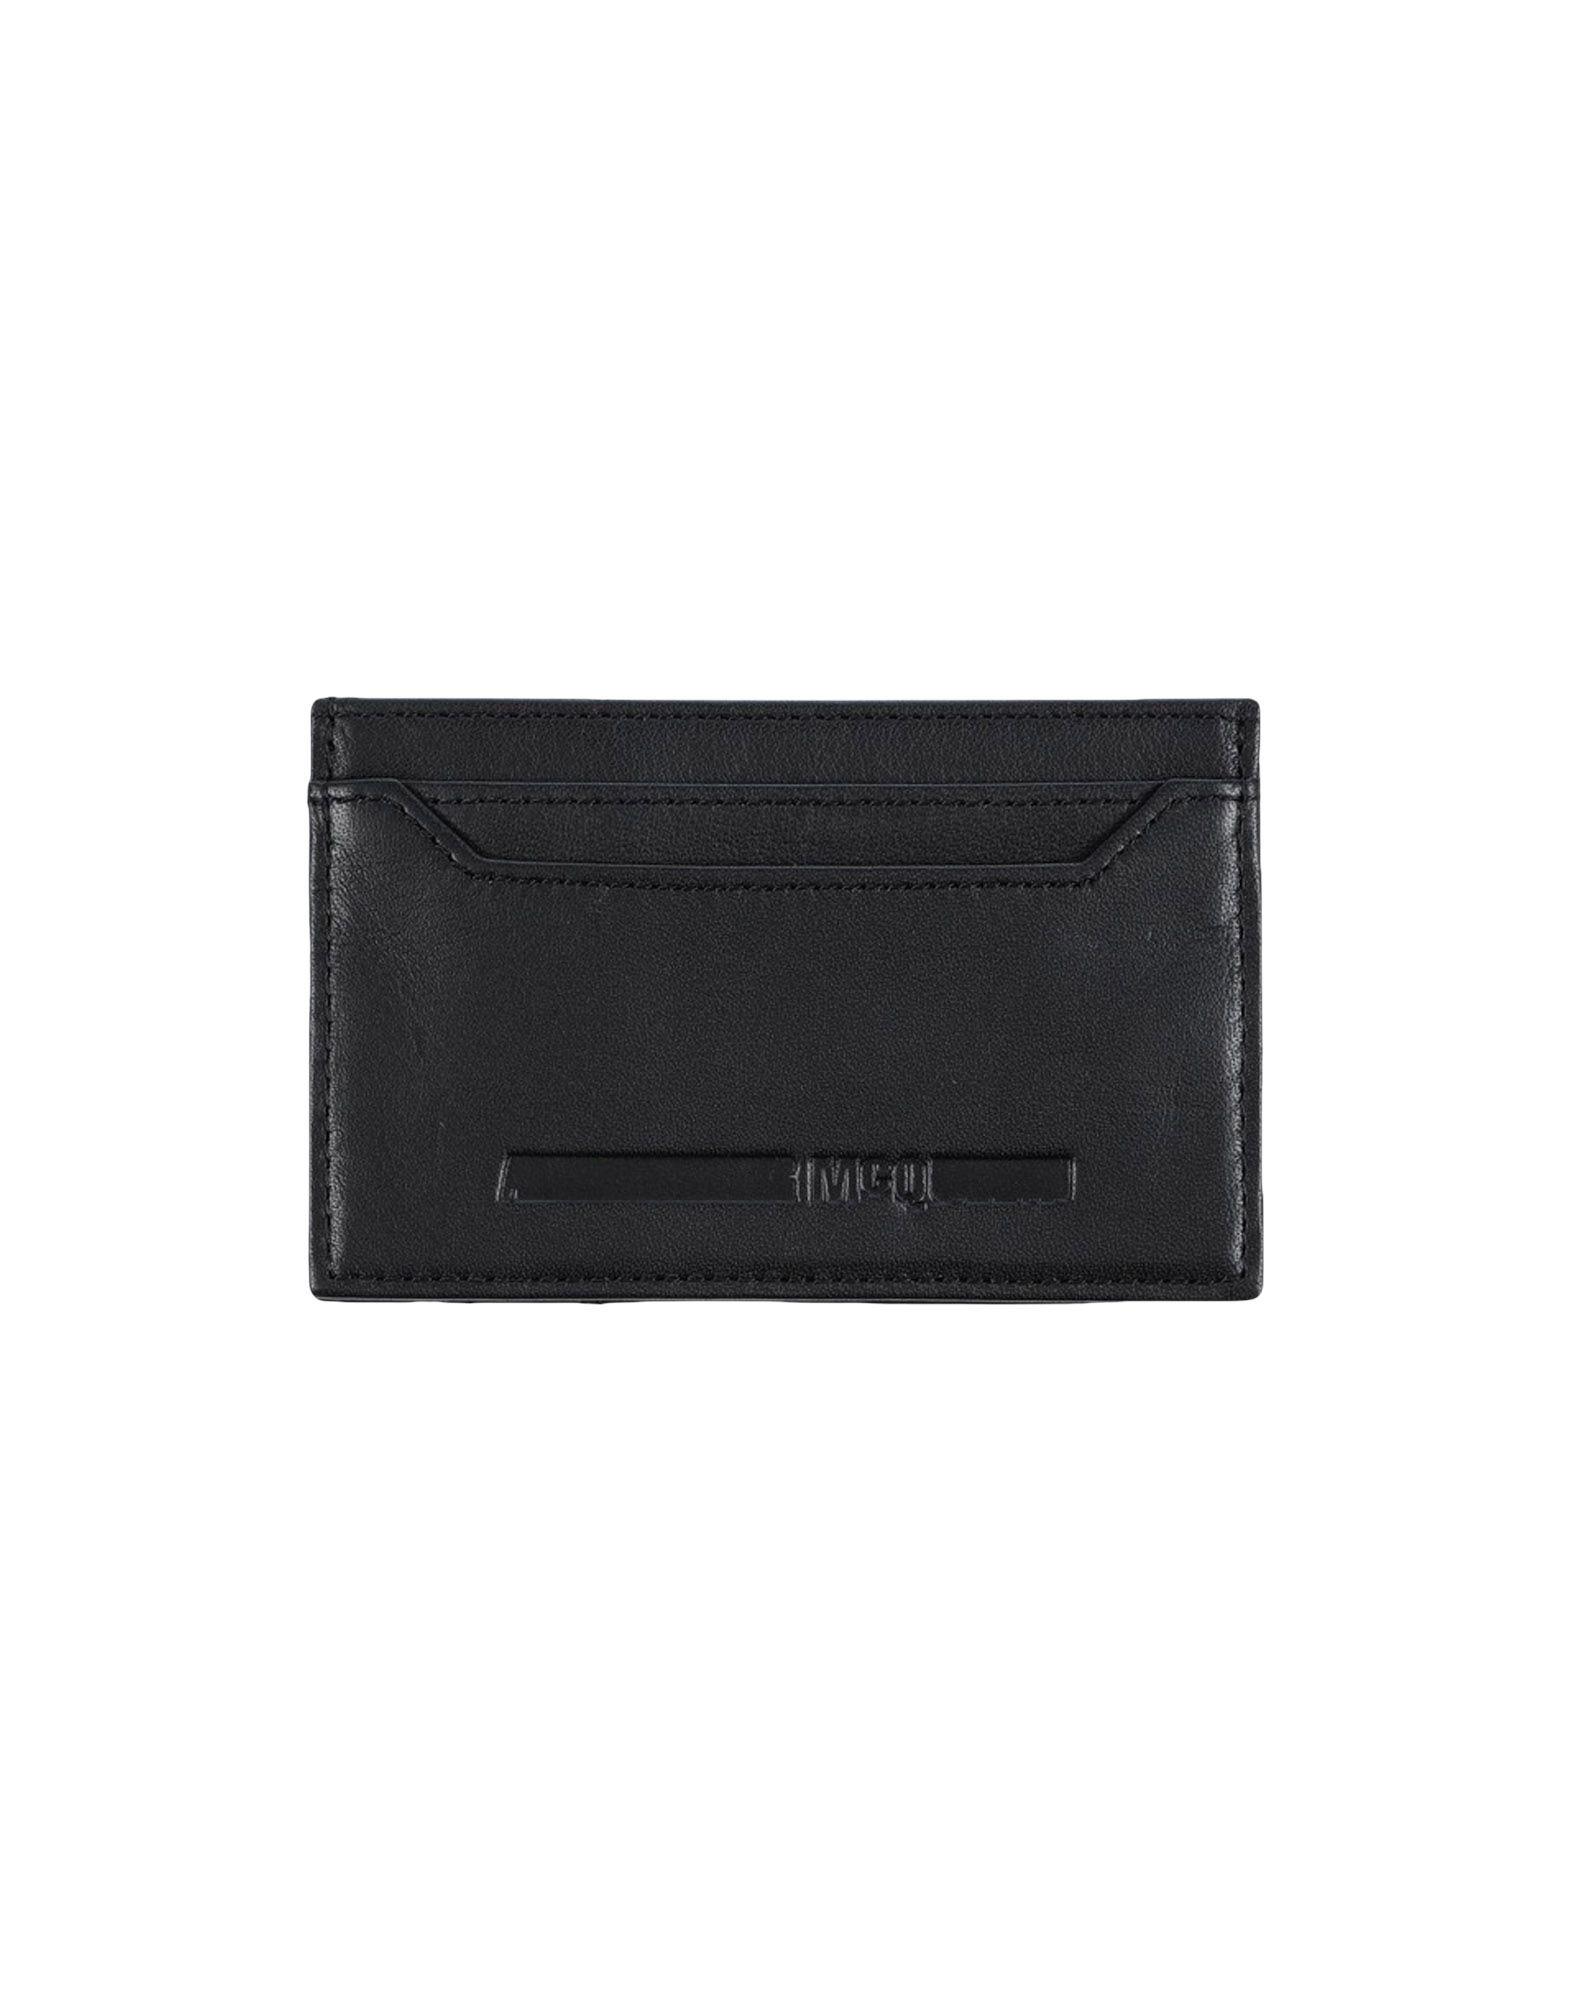 McQ Alexander McQueen メンズ 財布 ブラック 革